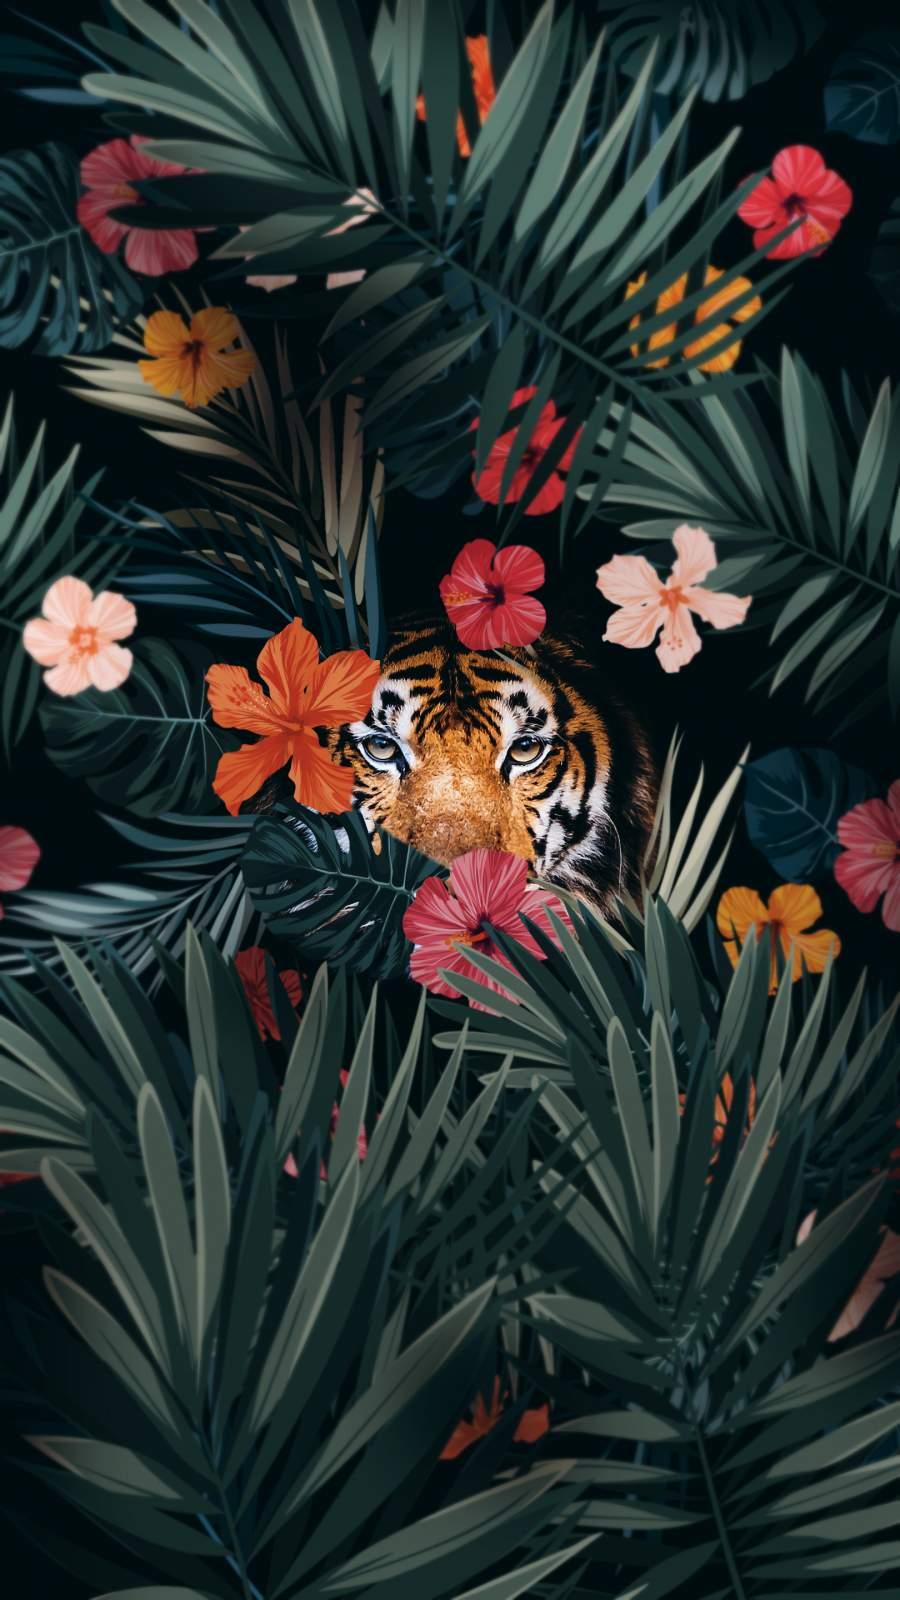 Tiger Hiding iPhone Wallpaper